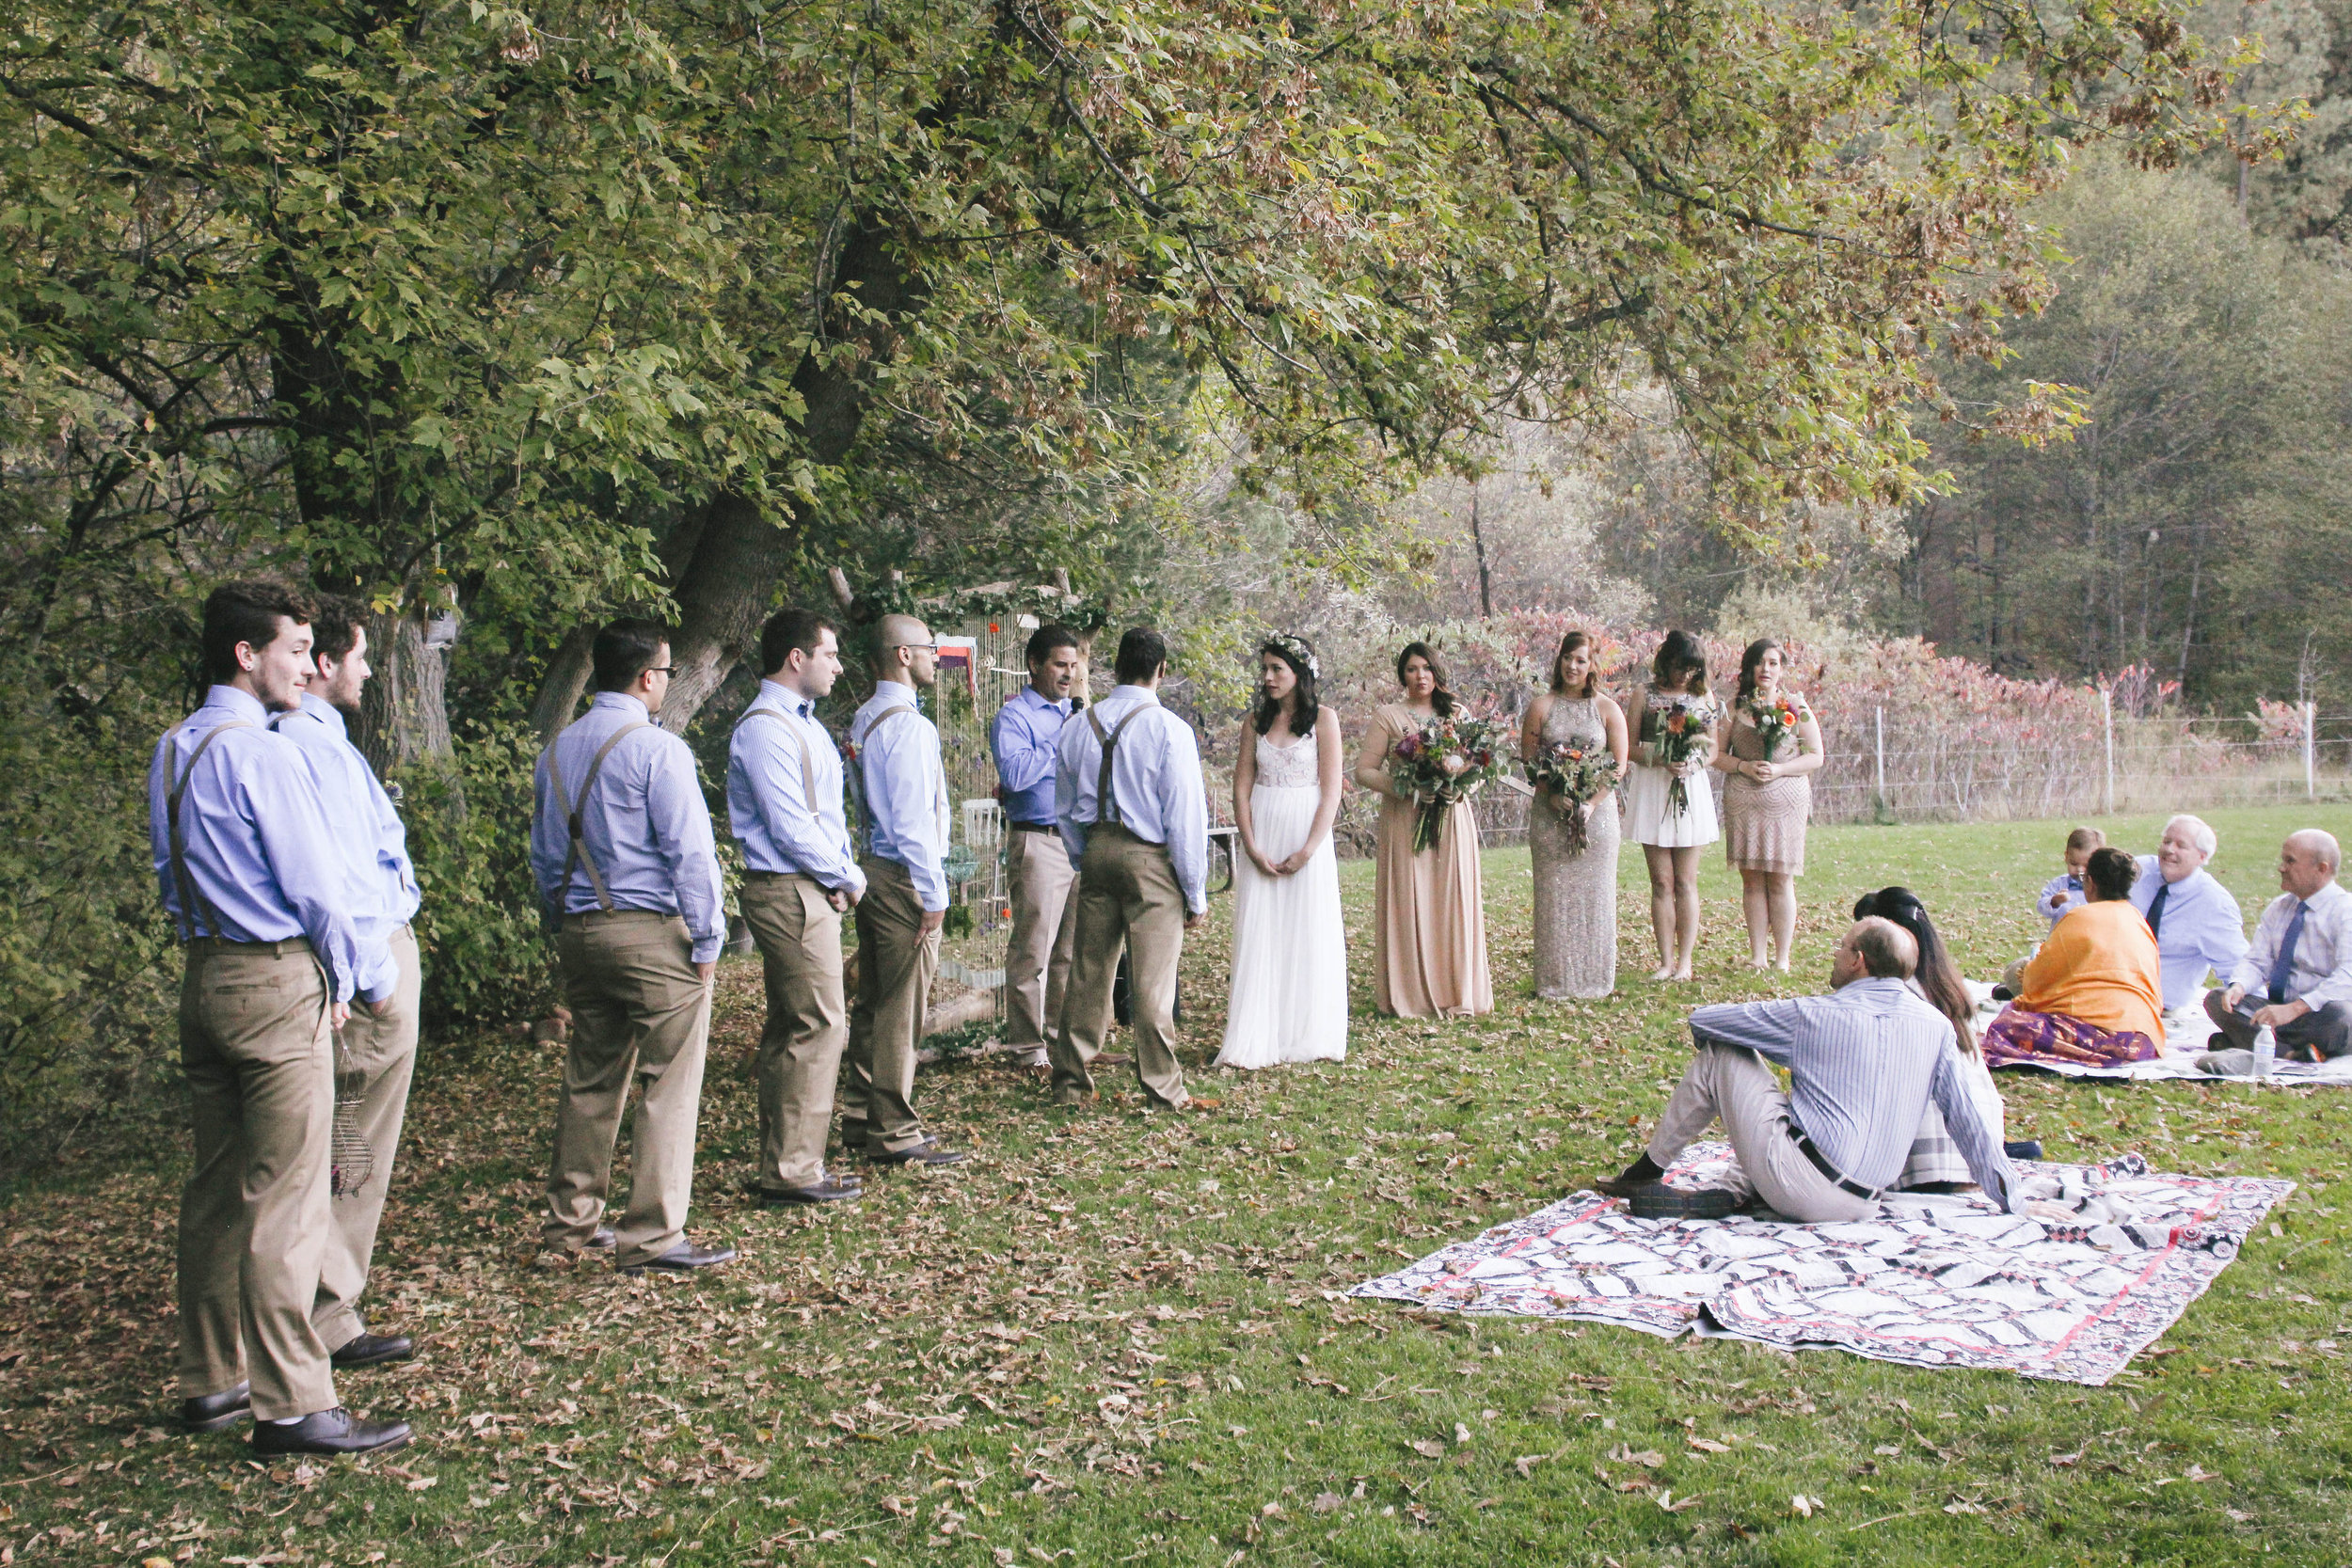 DIY Boho Wedding in the Mountains of Payson, Arizona- Konsider It Done- AZ Arizona Wedding & Event Planner, Designer, Coordinator Planning in Scottsdale, Phoenix, Paradise Valley, Tempe, Gilbert, Mesa, Chandler, Tucson, Sedona